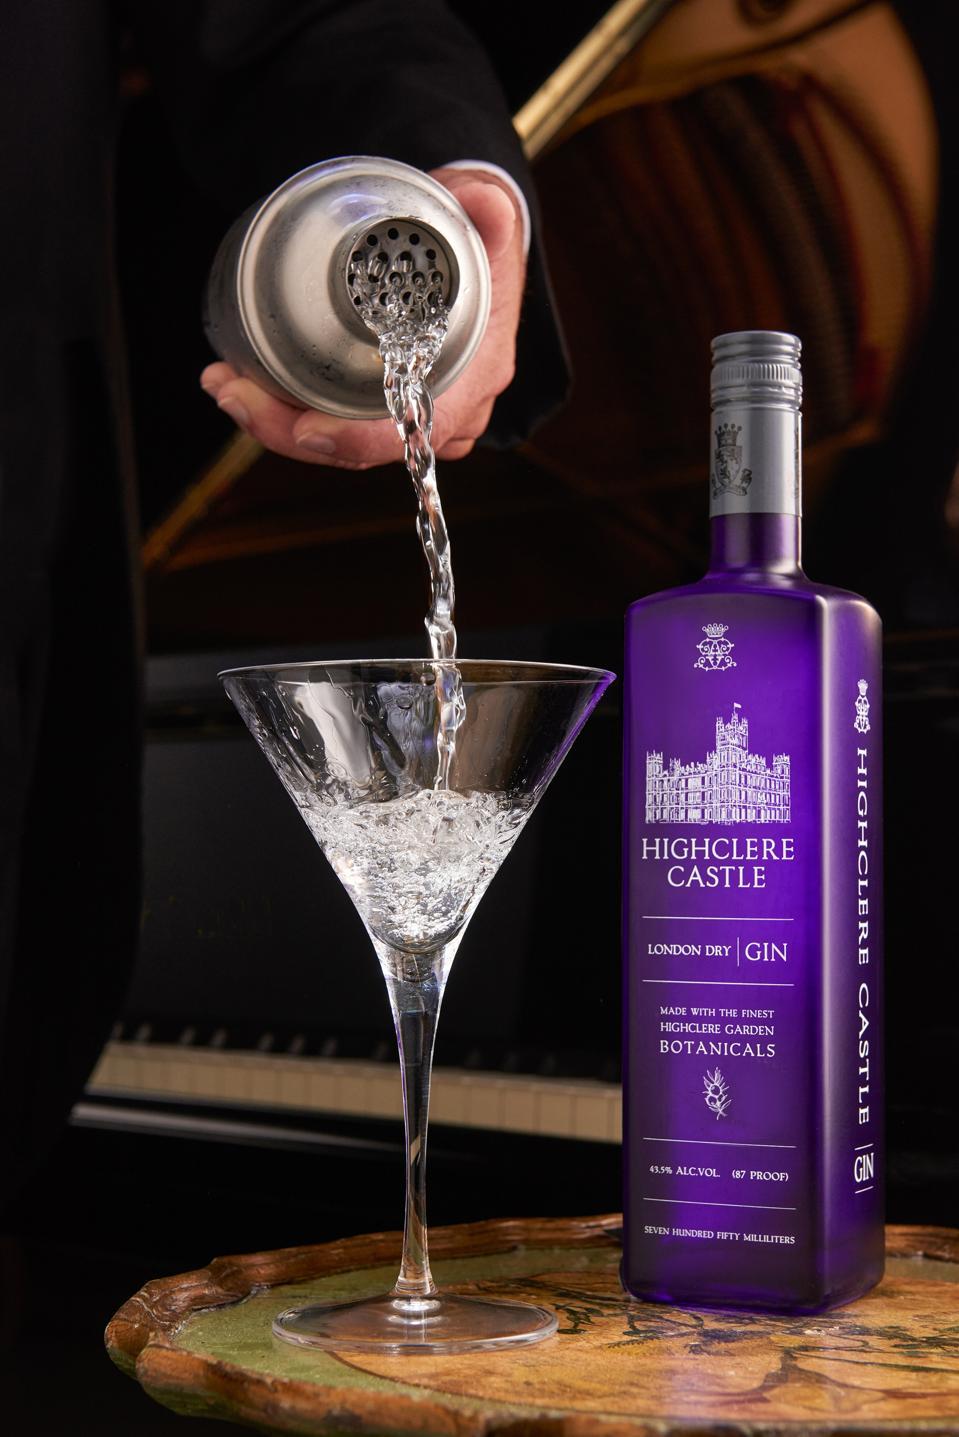 martini bottle glass and shaker